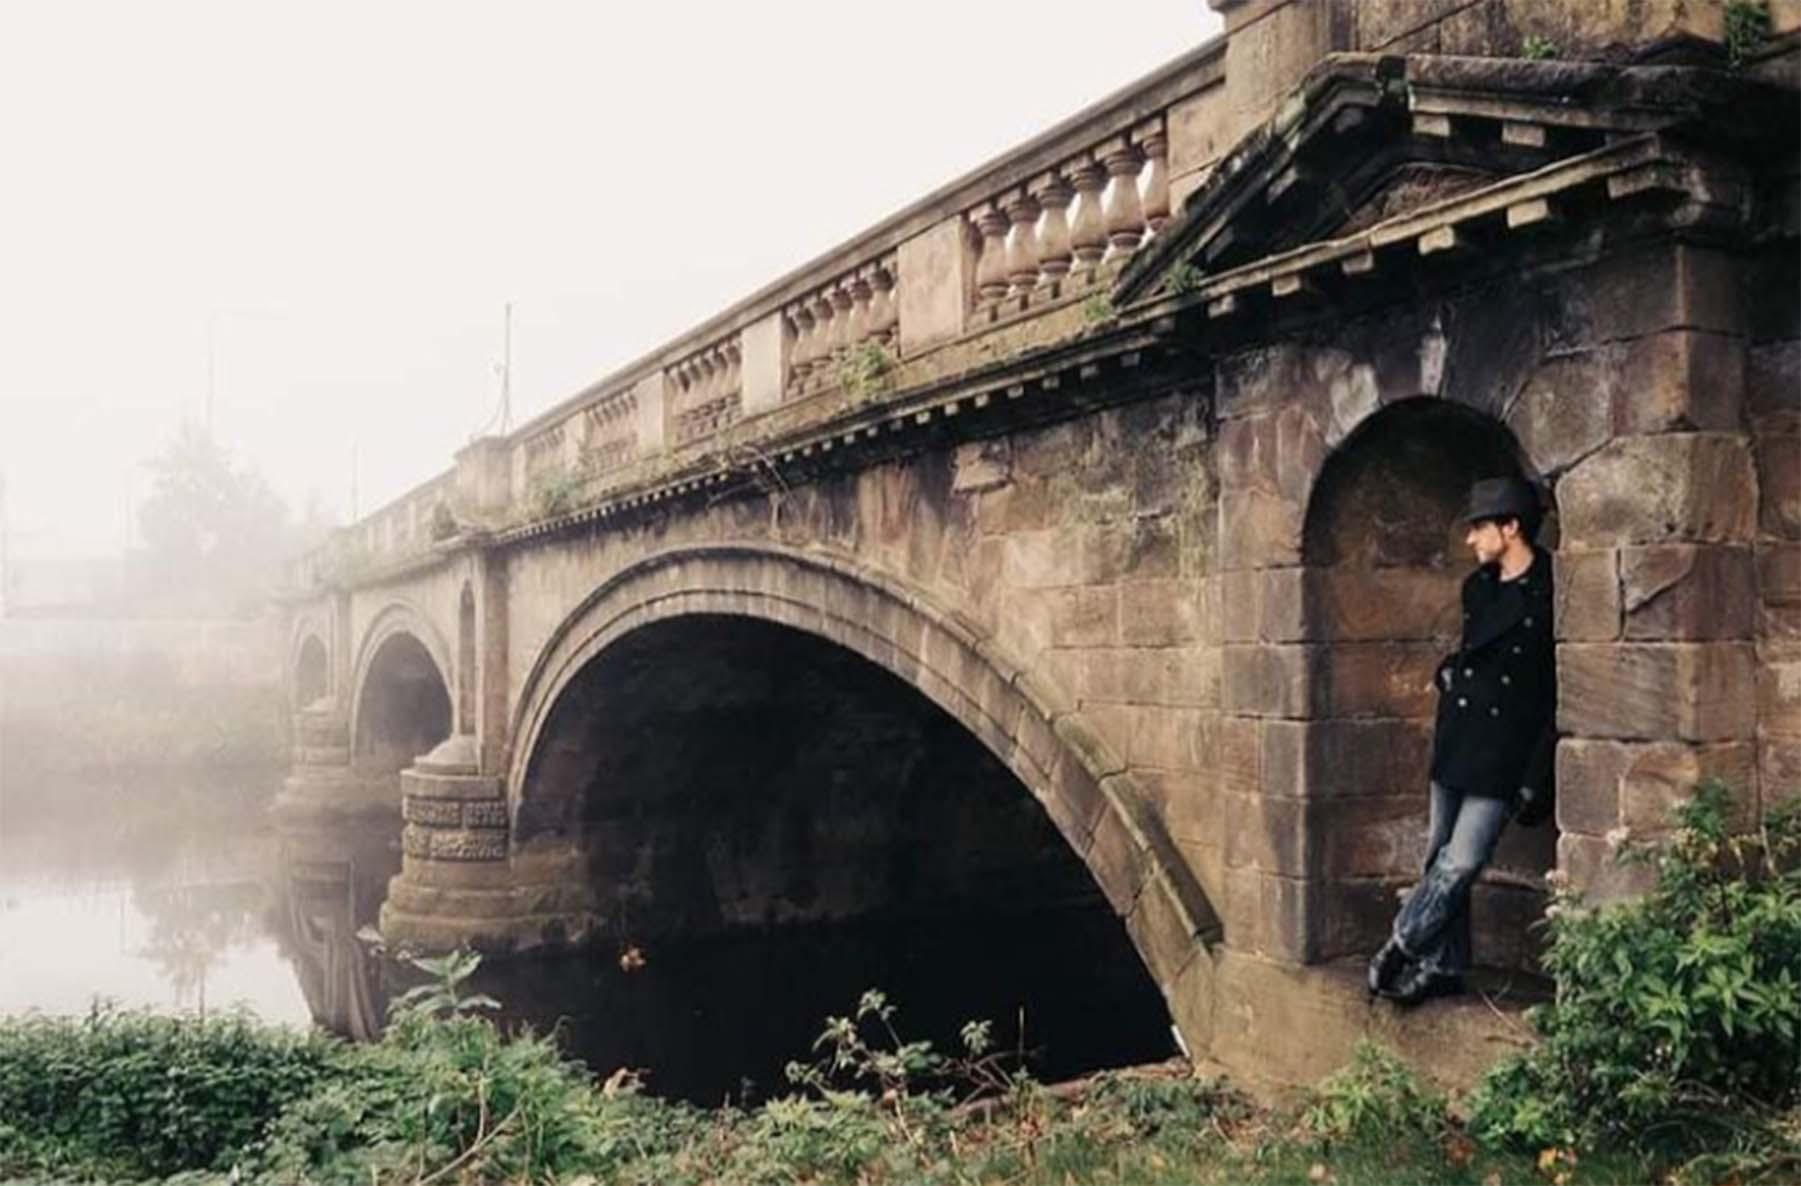 Doodah photography: Derby bridge